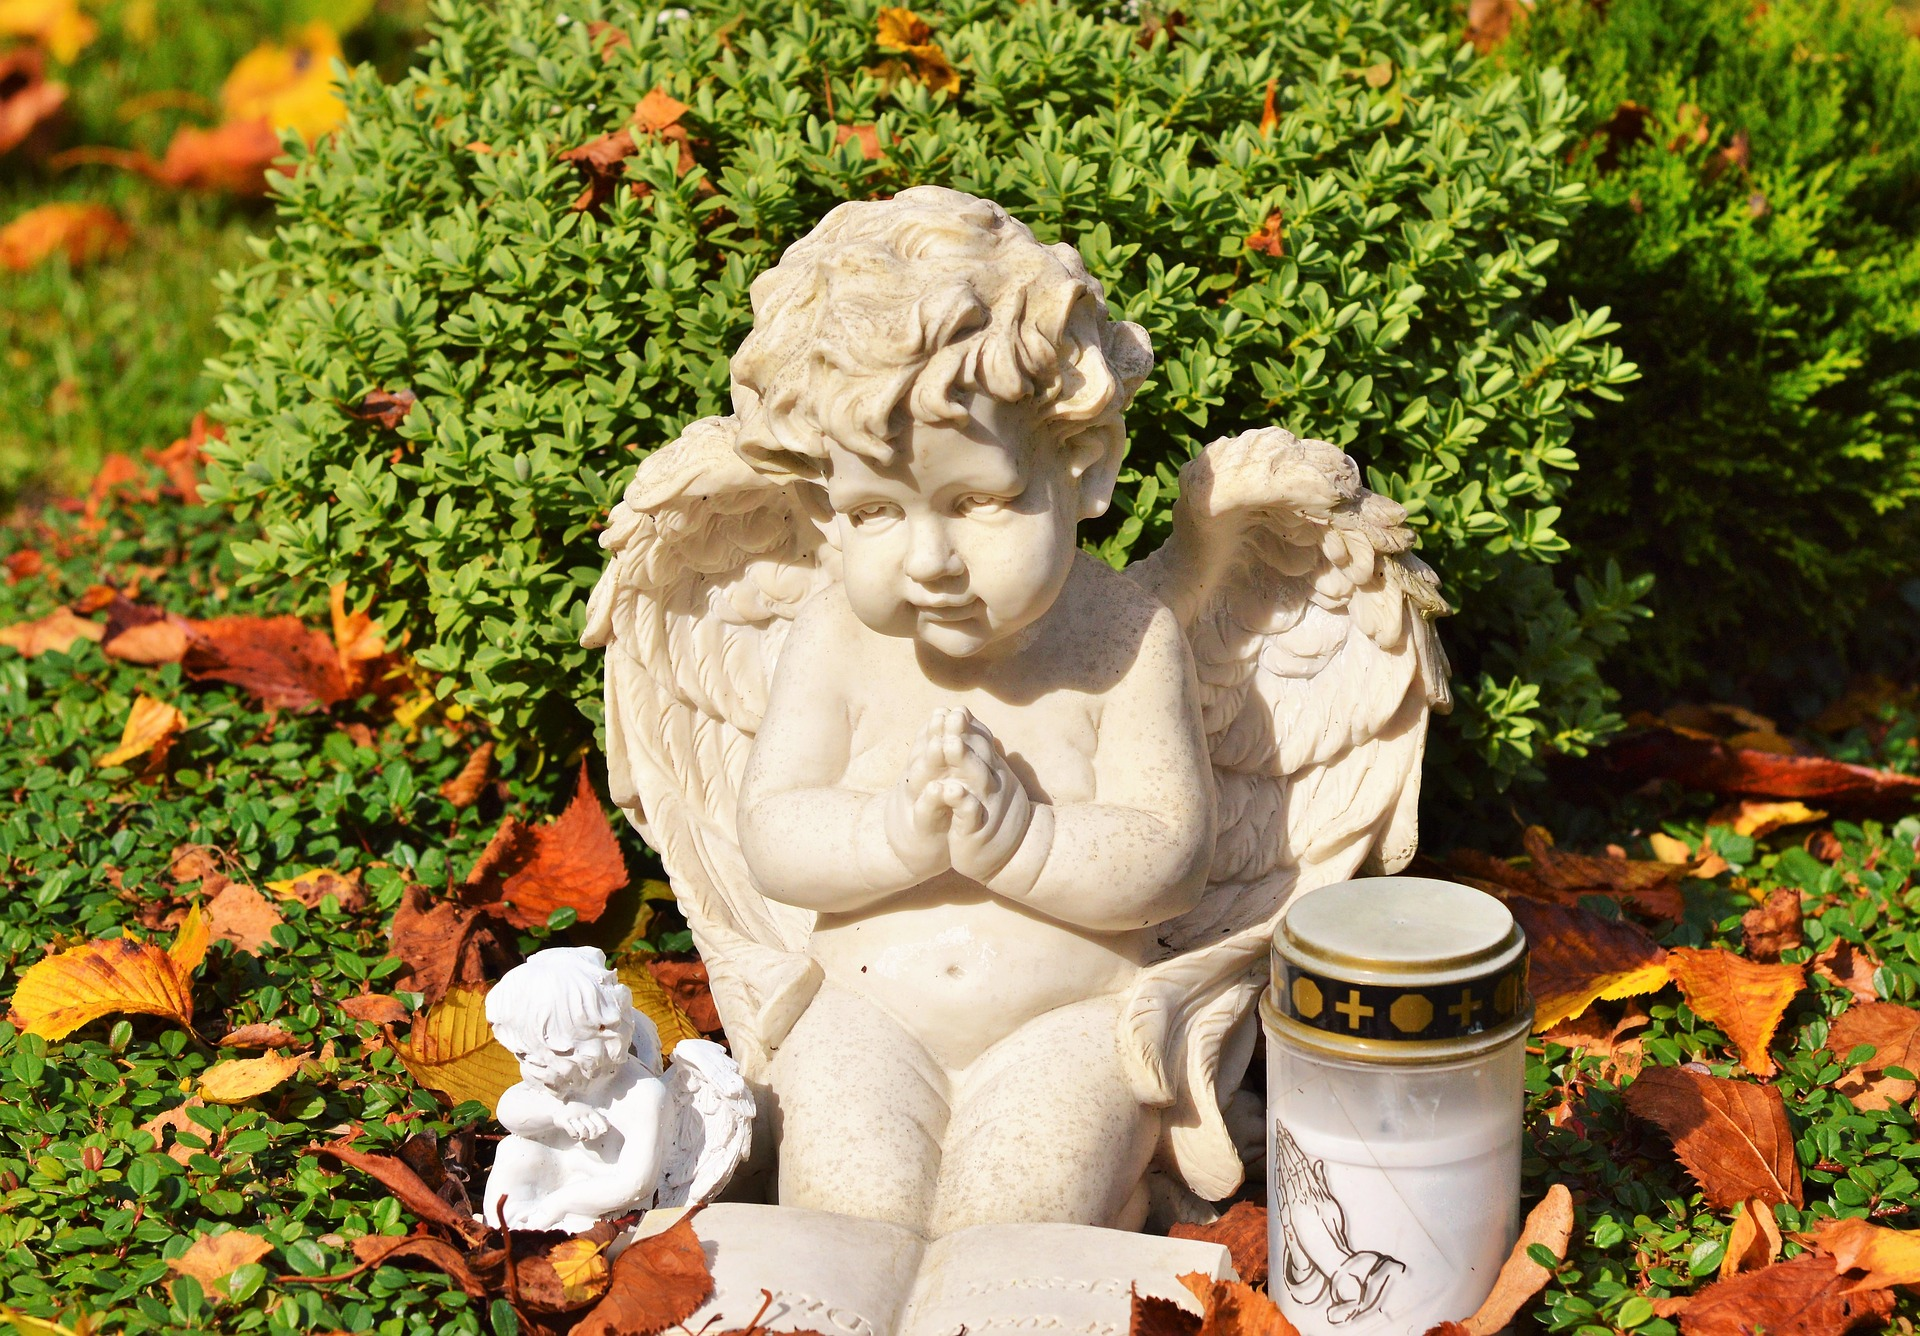 angel-2847809_1920.jpg